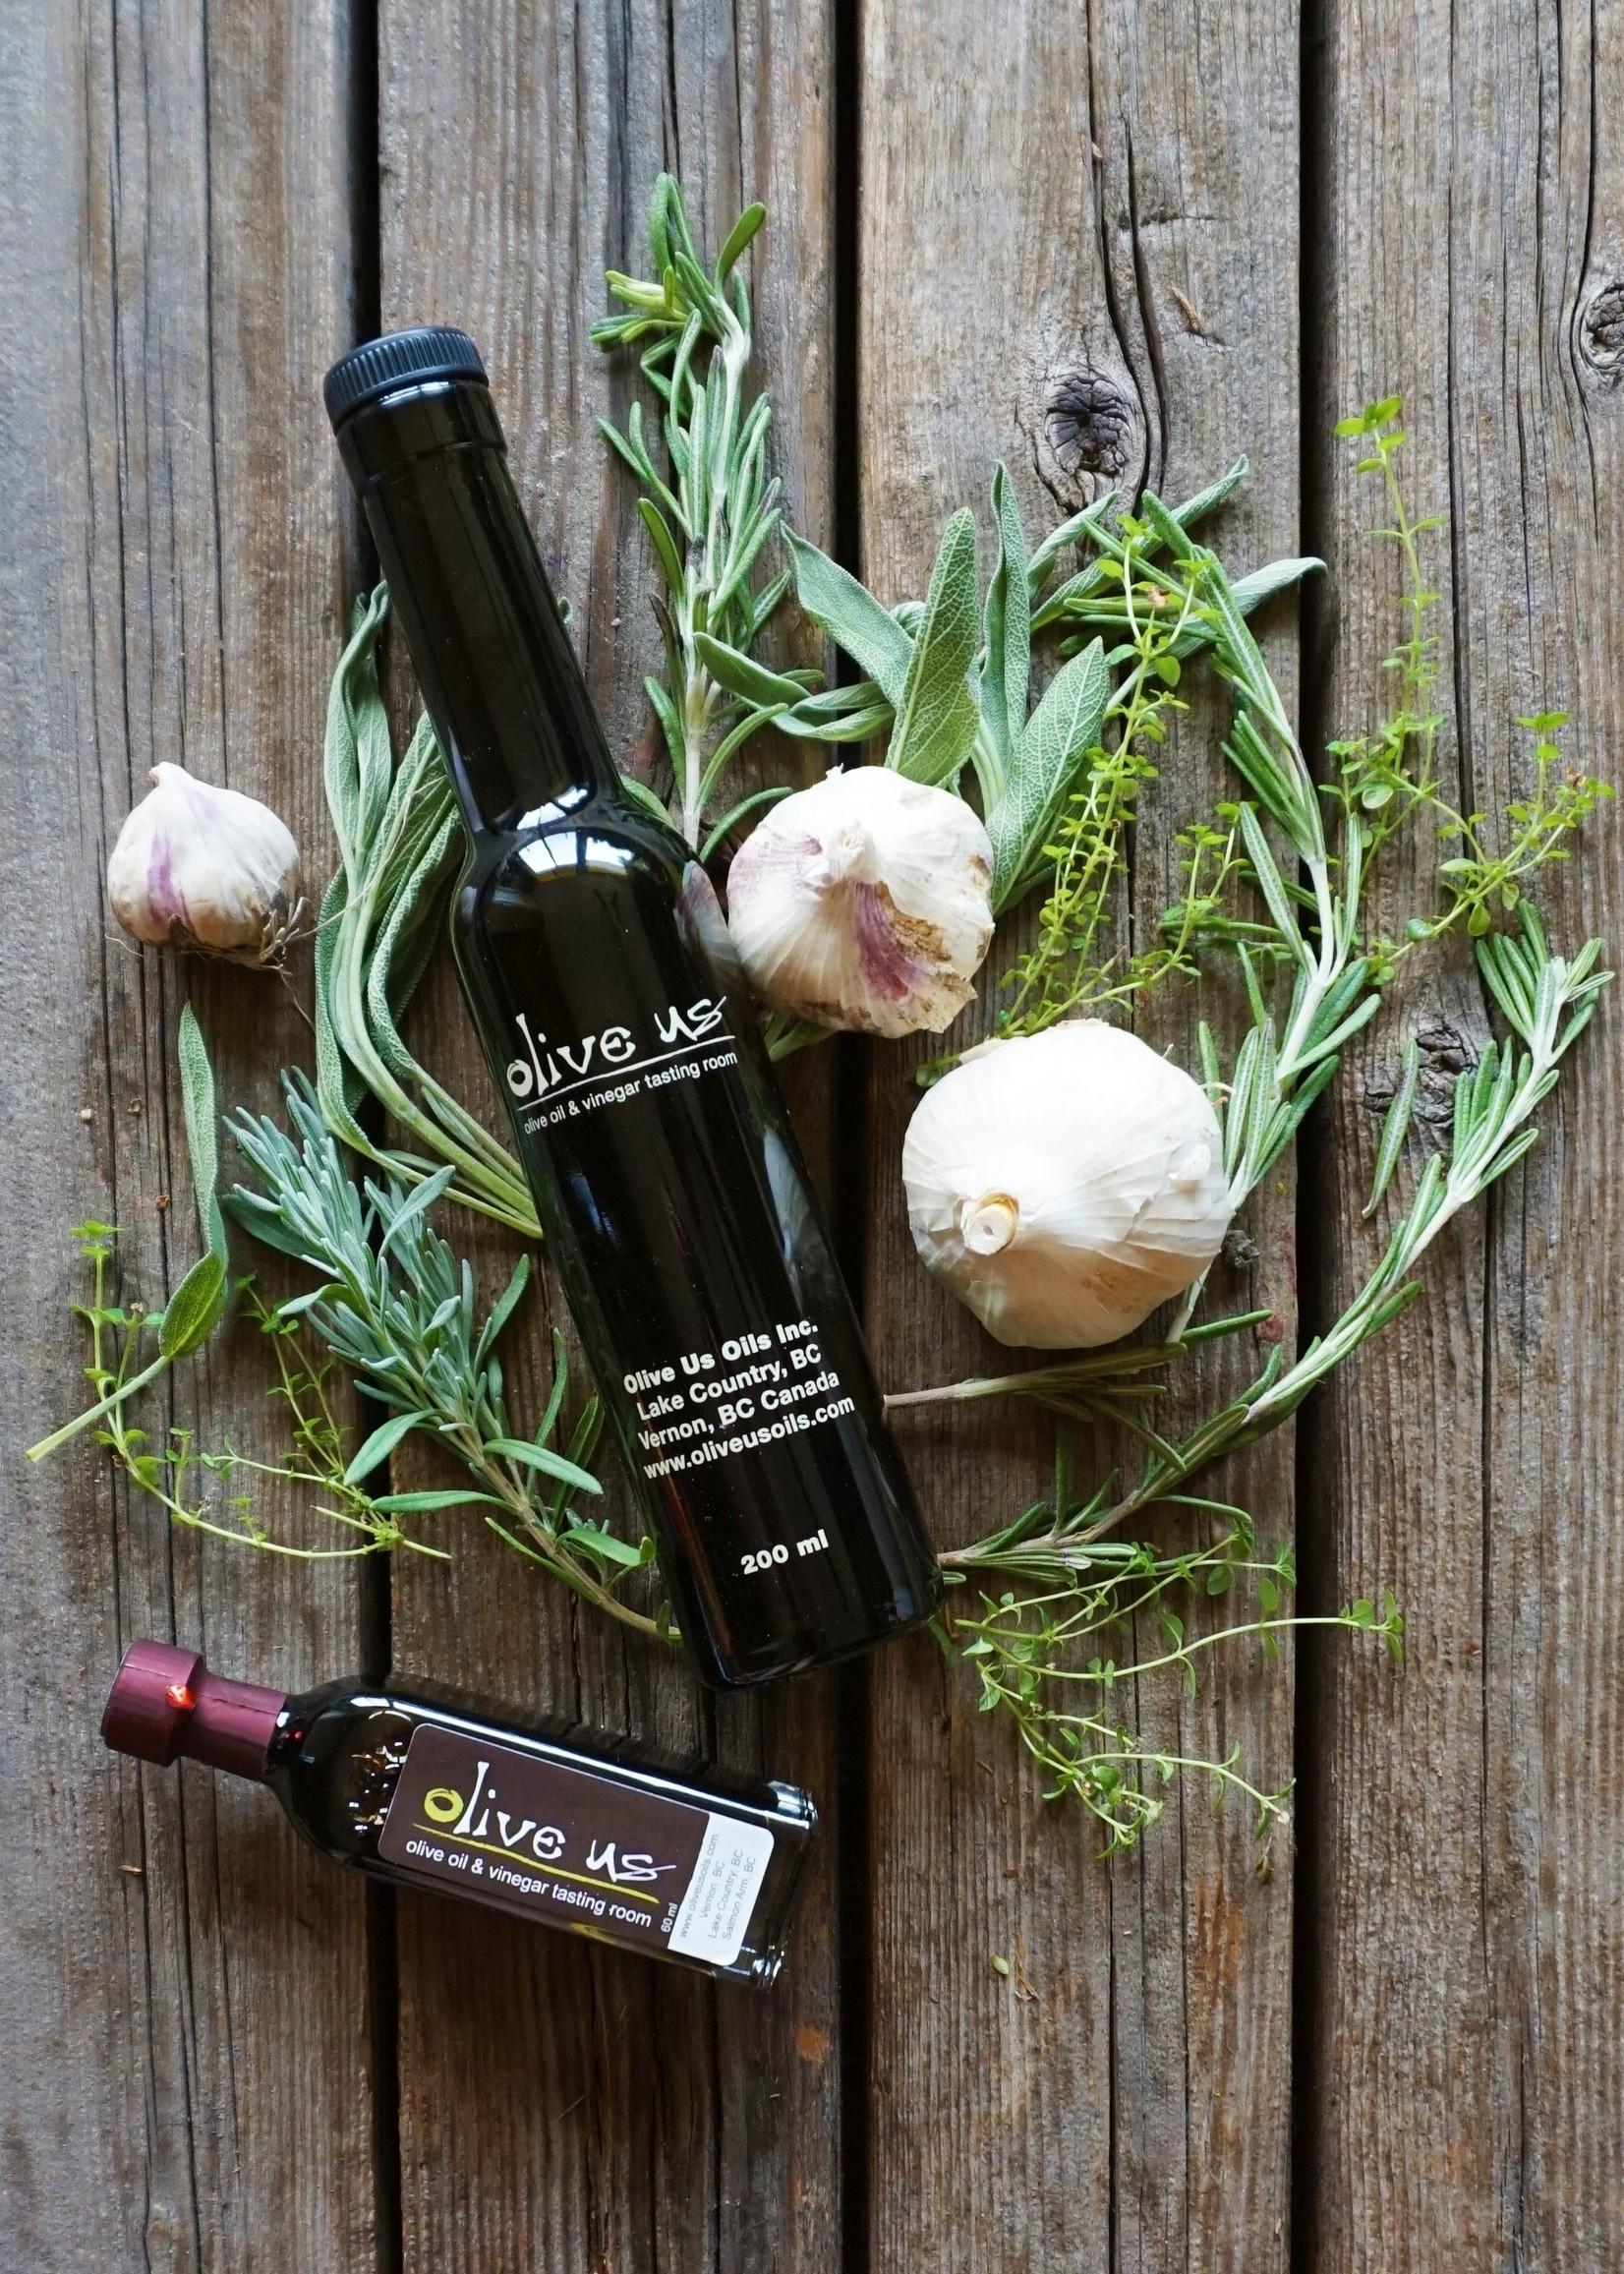 Olive Us Neapolitan Herb Dark Balsamic